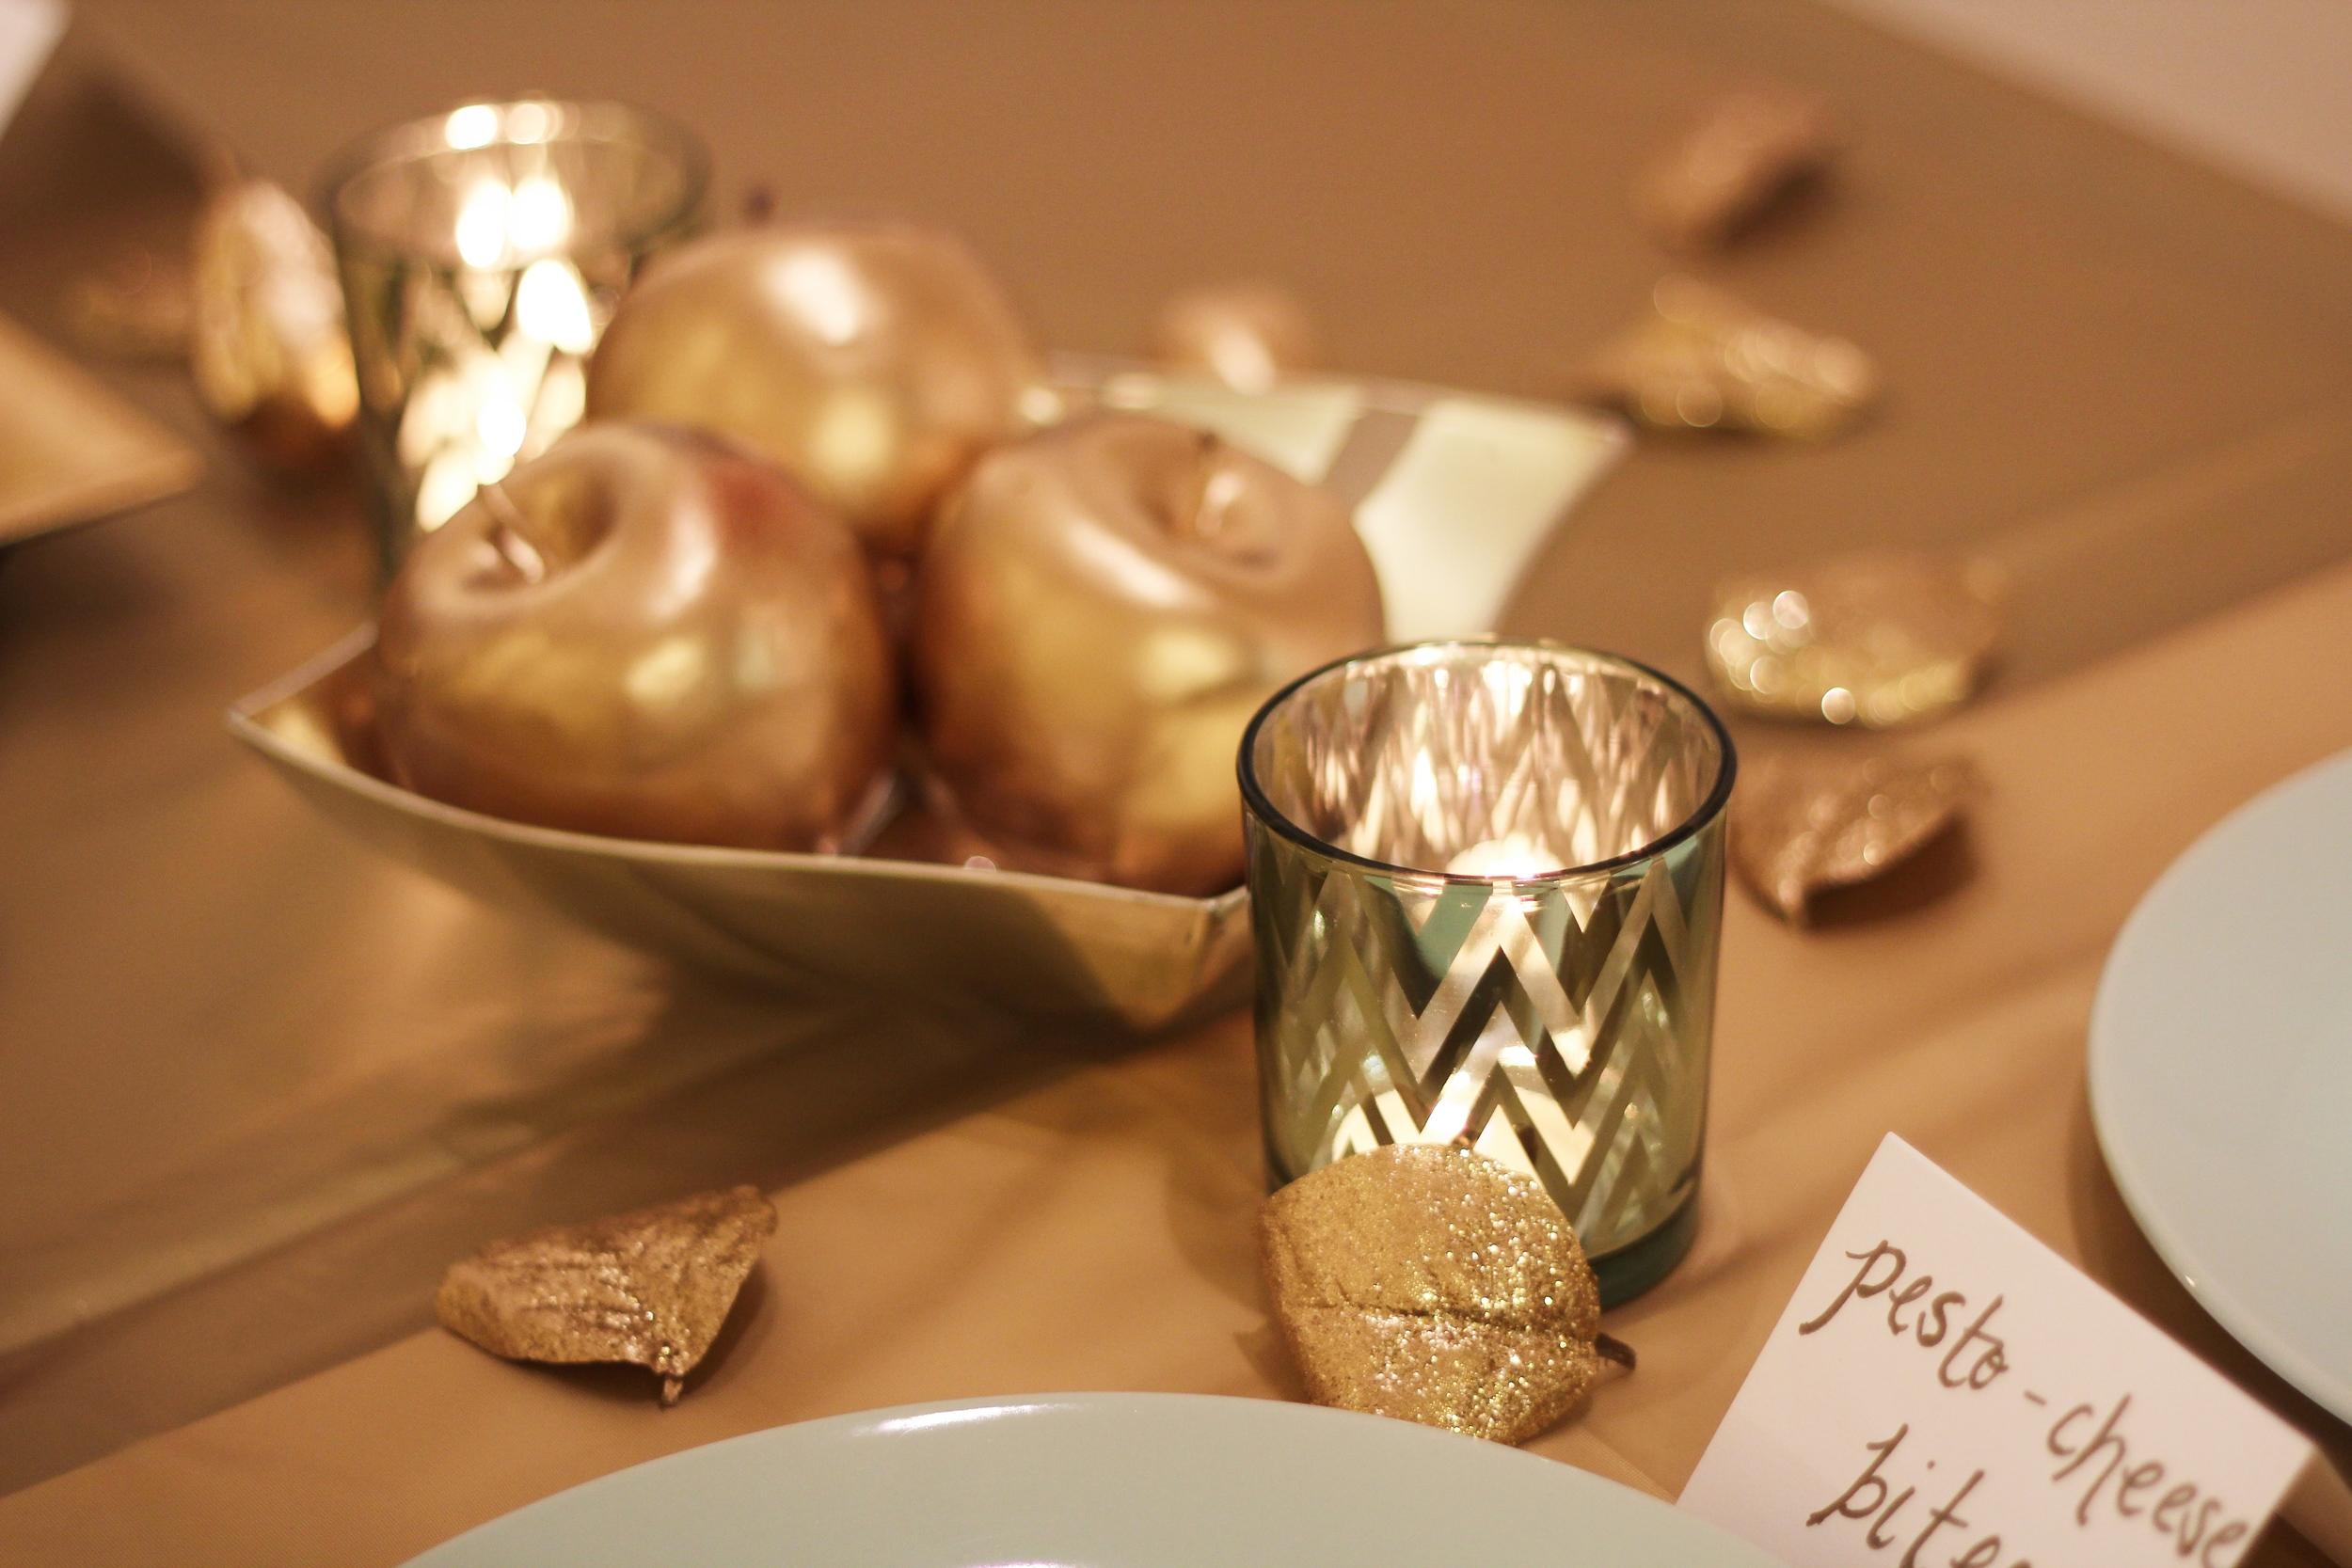 chevron candle holders, golden apples, glitter leaves